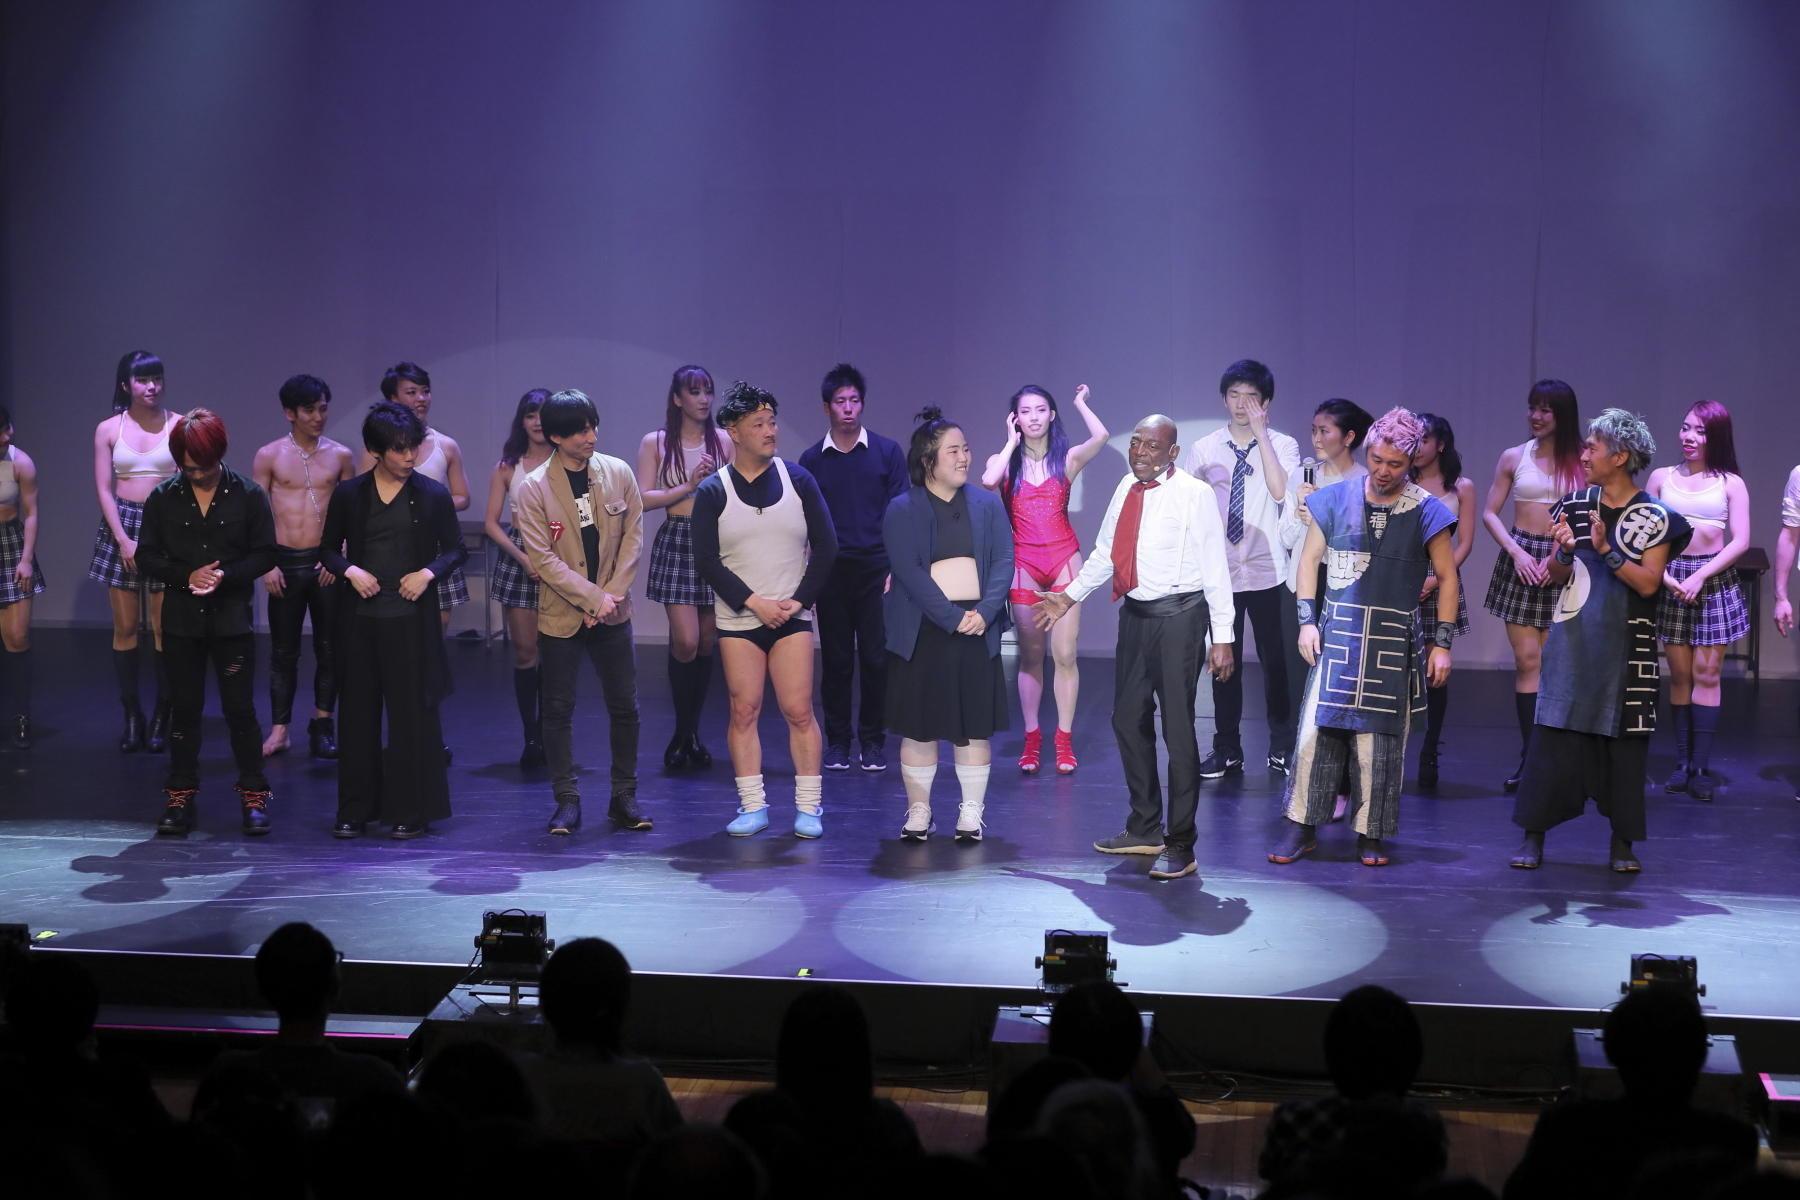 http://news.yoshimoto.co.jp/20180414112926-fcba0c61338a90416c76f3694662091cd0bc186a.jpg